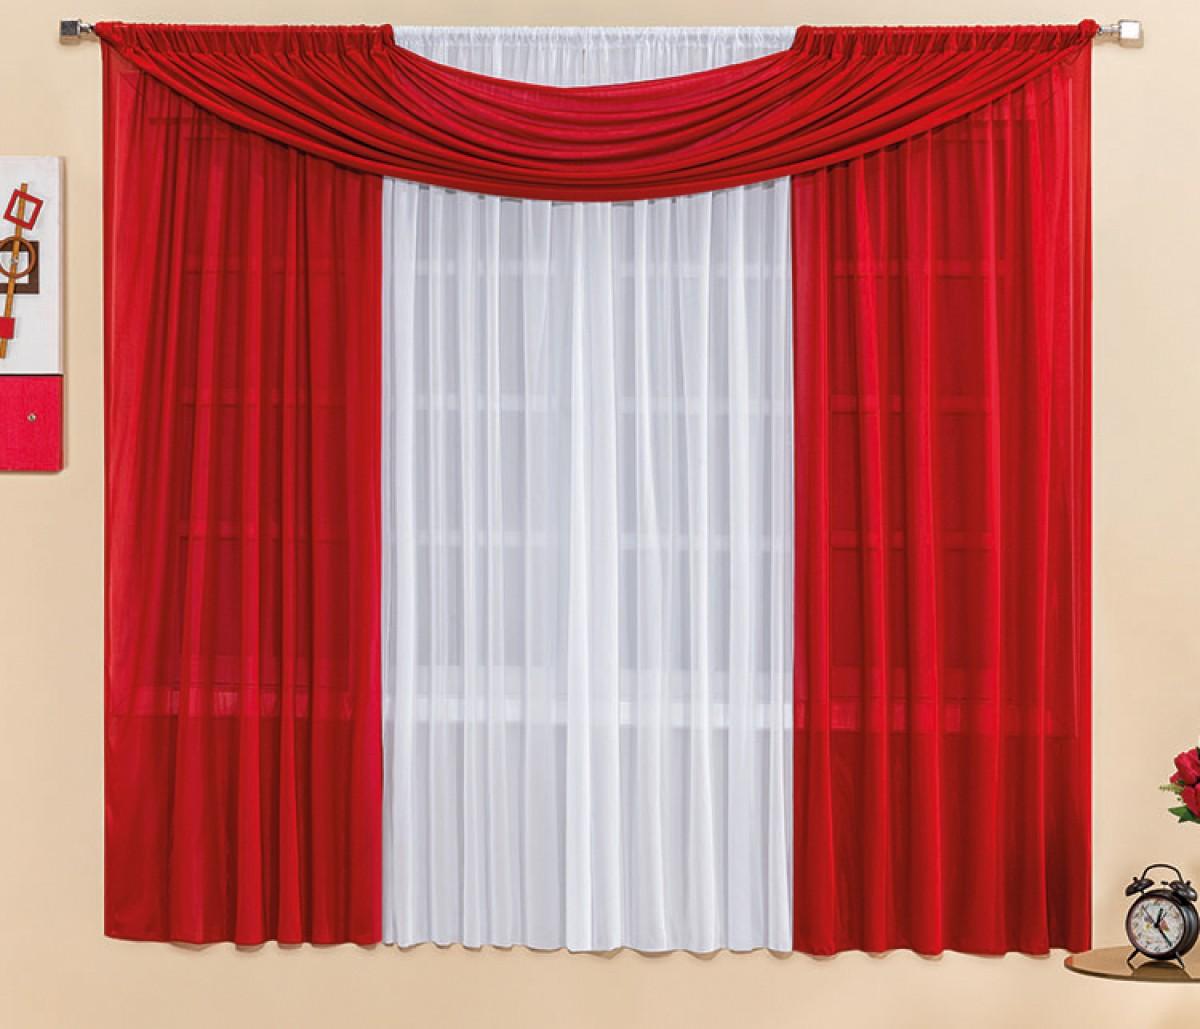 Cortina Vermelha Branca Para Var O Simples 3 00m X 2 50m Manu Loja